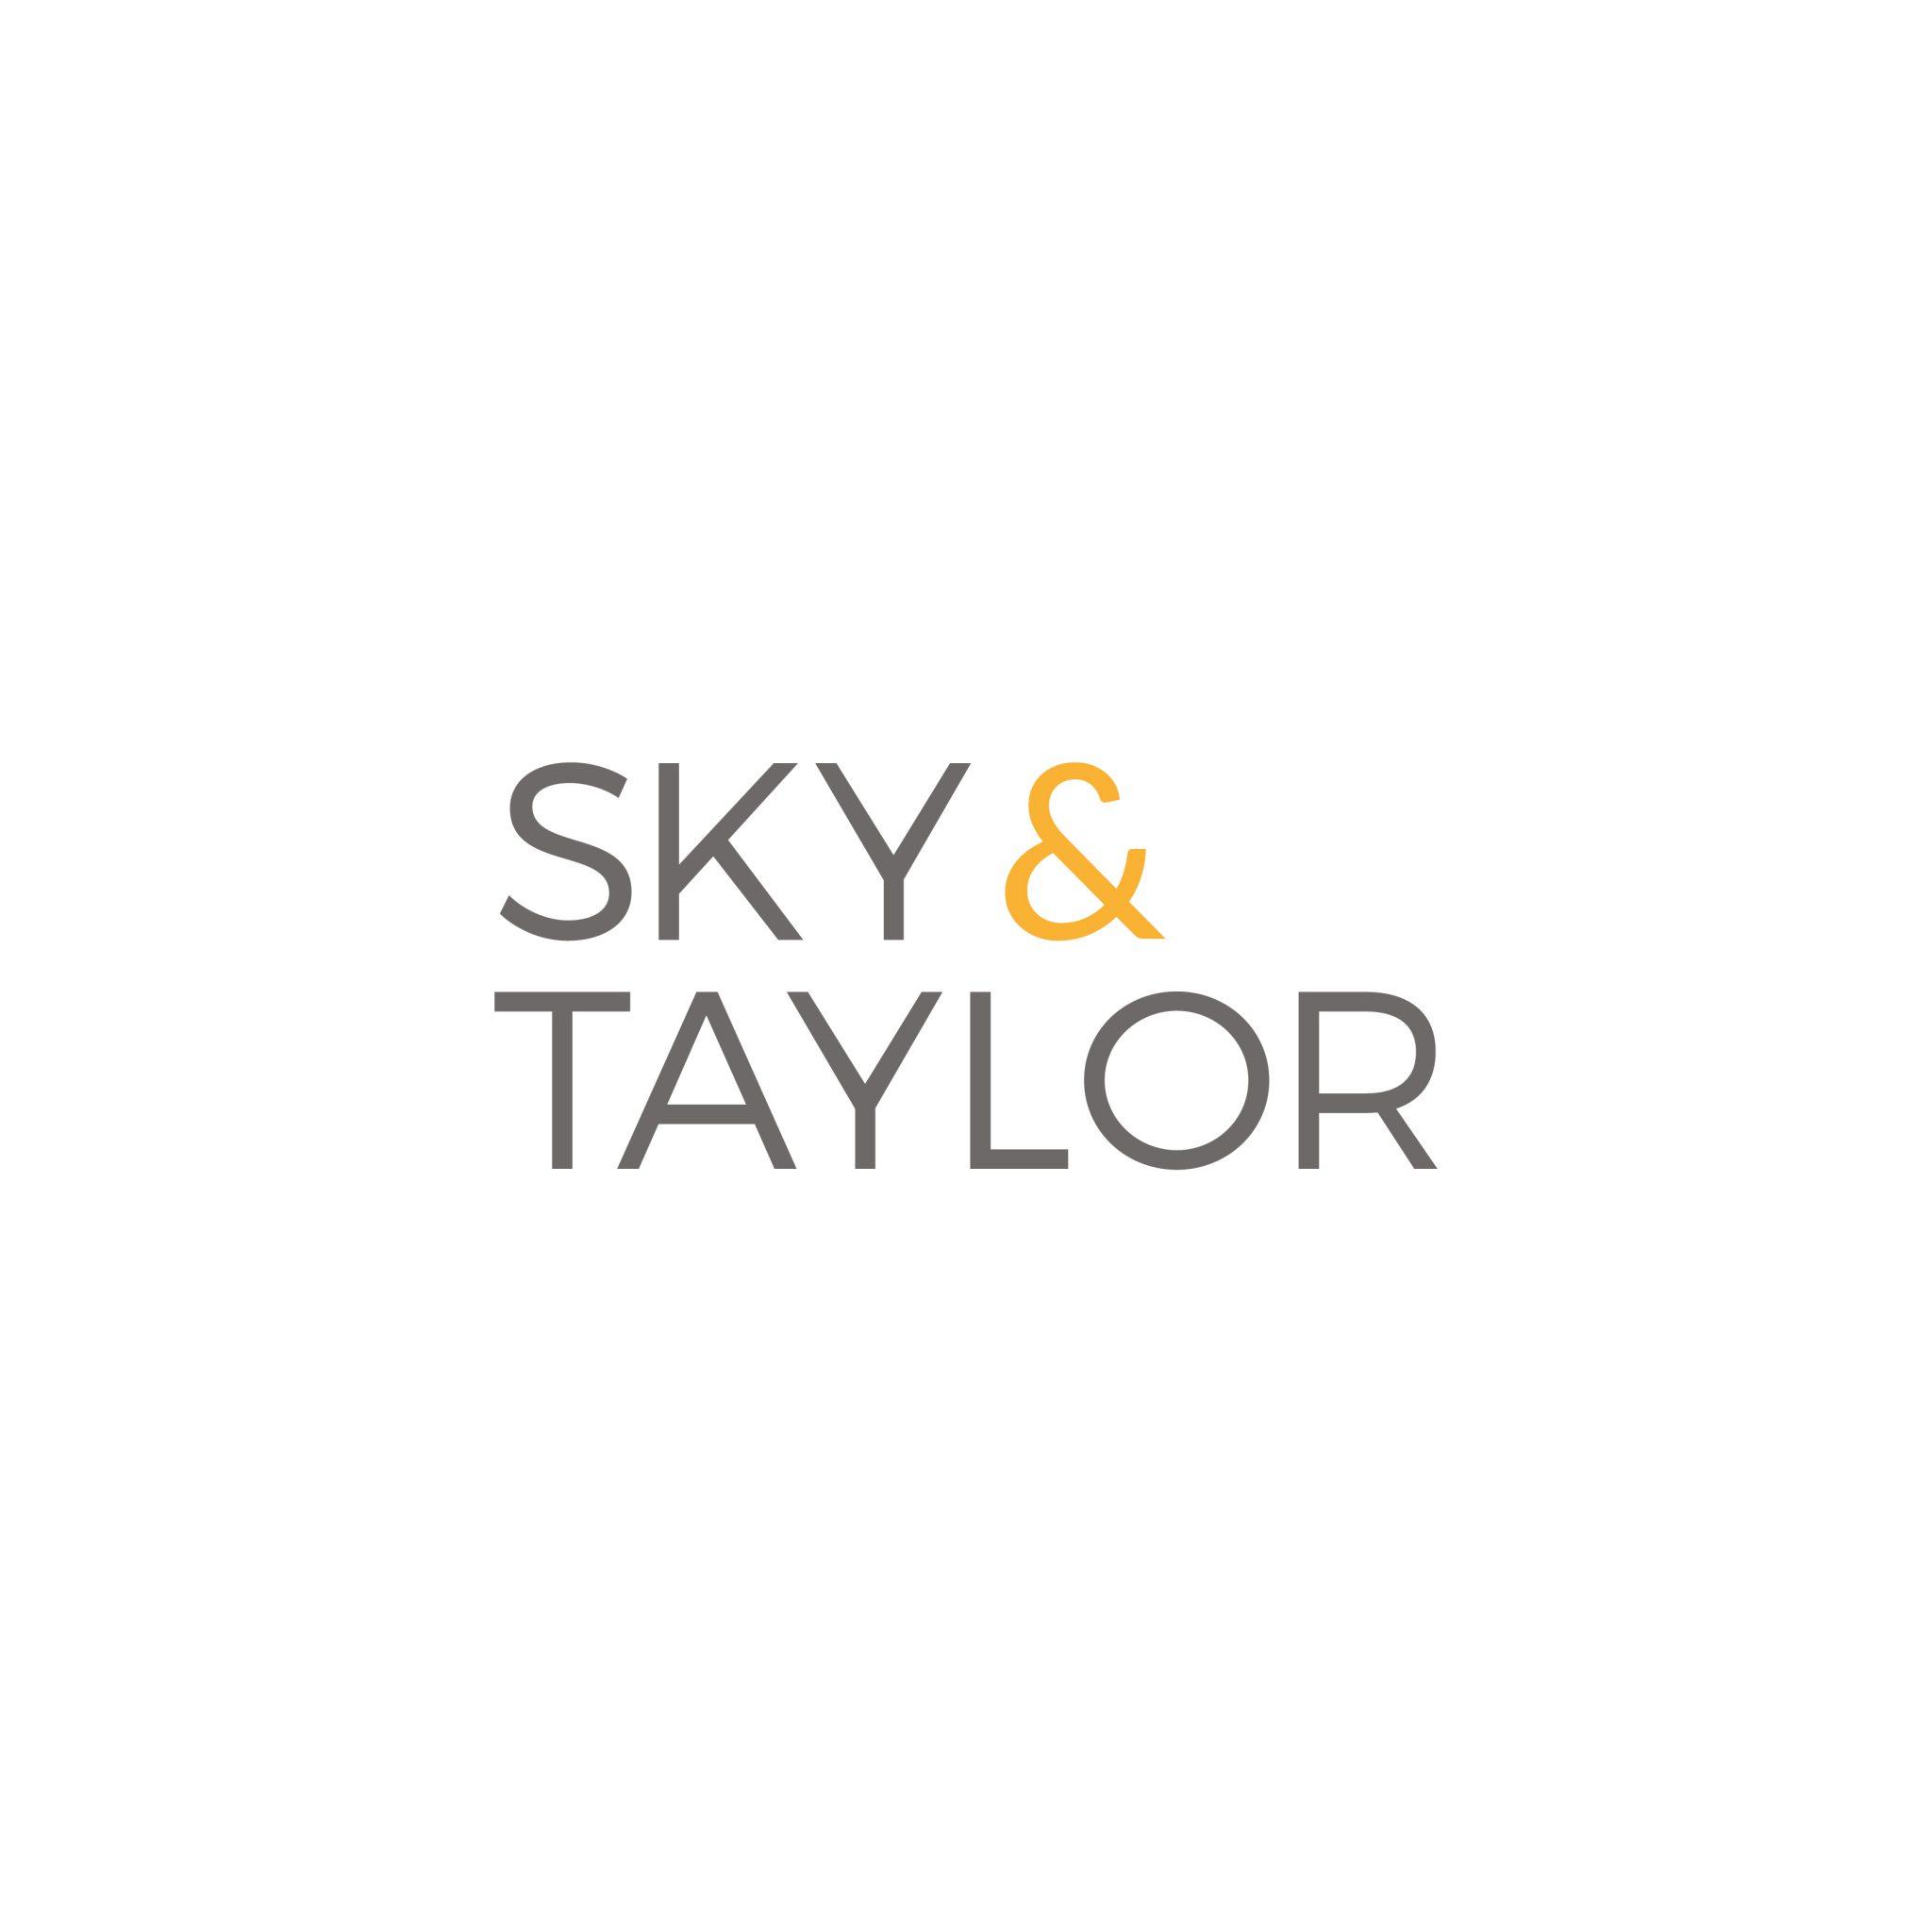 Sky & Taylor